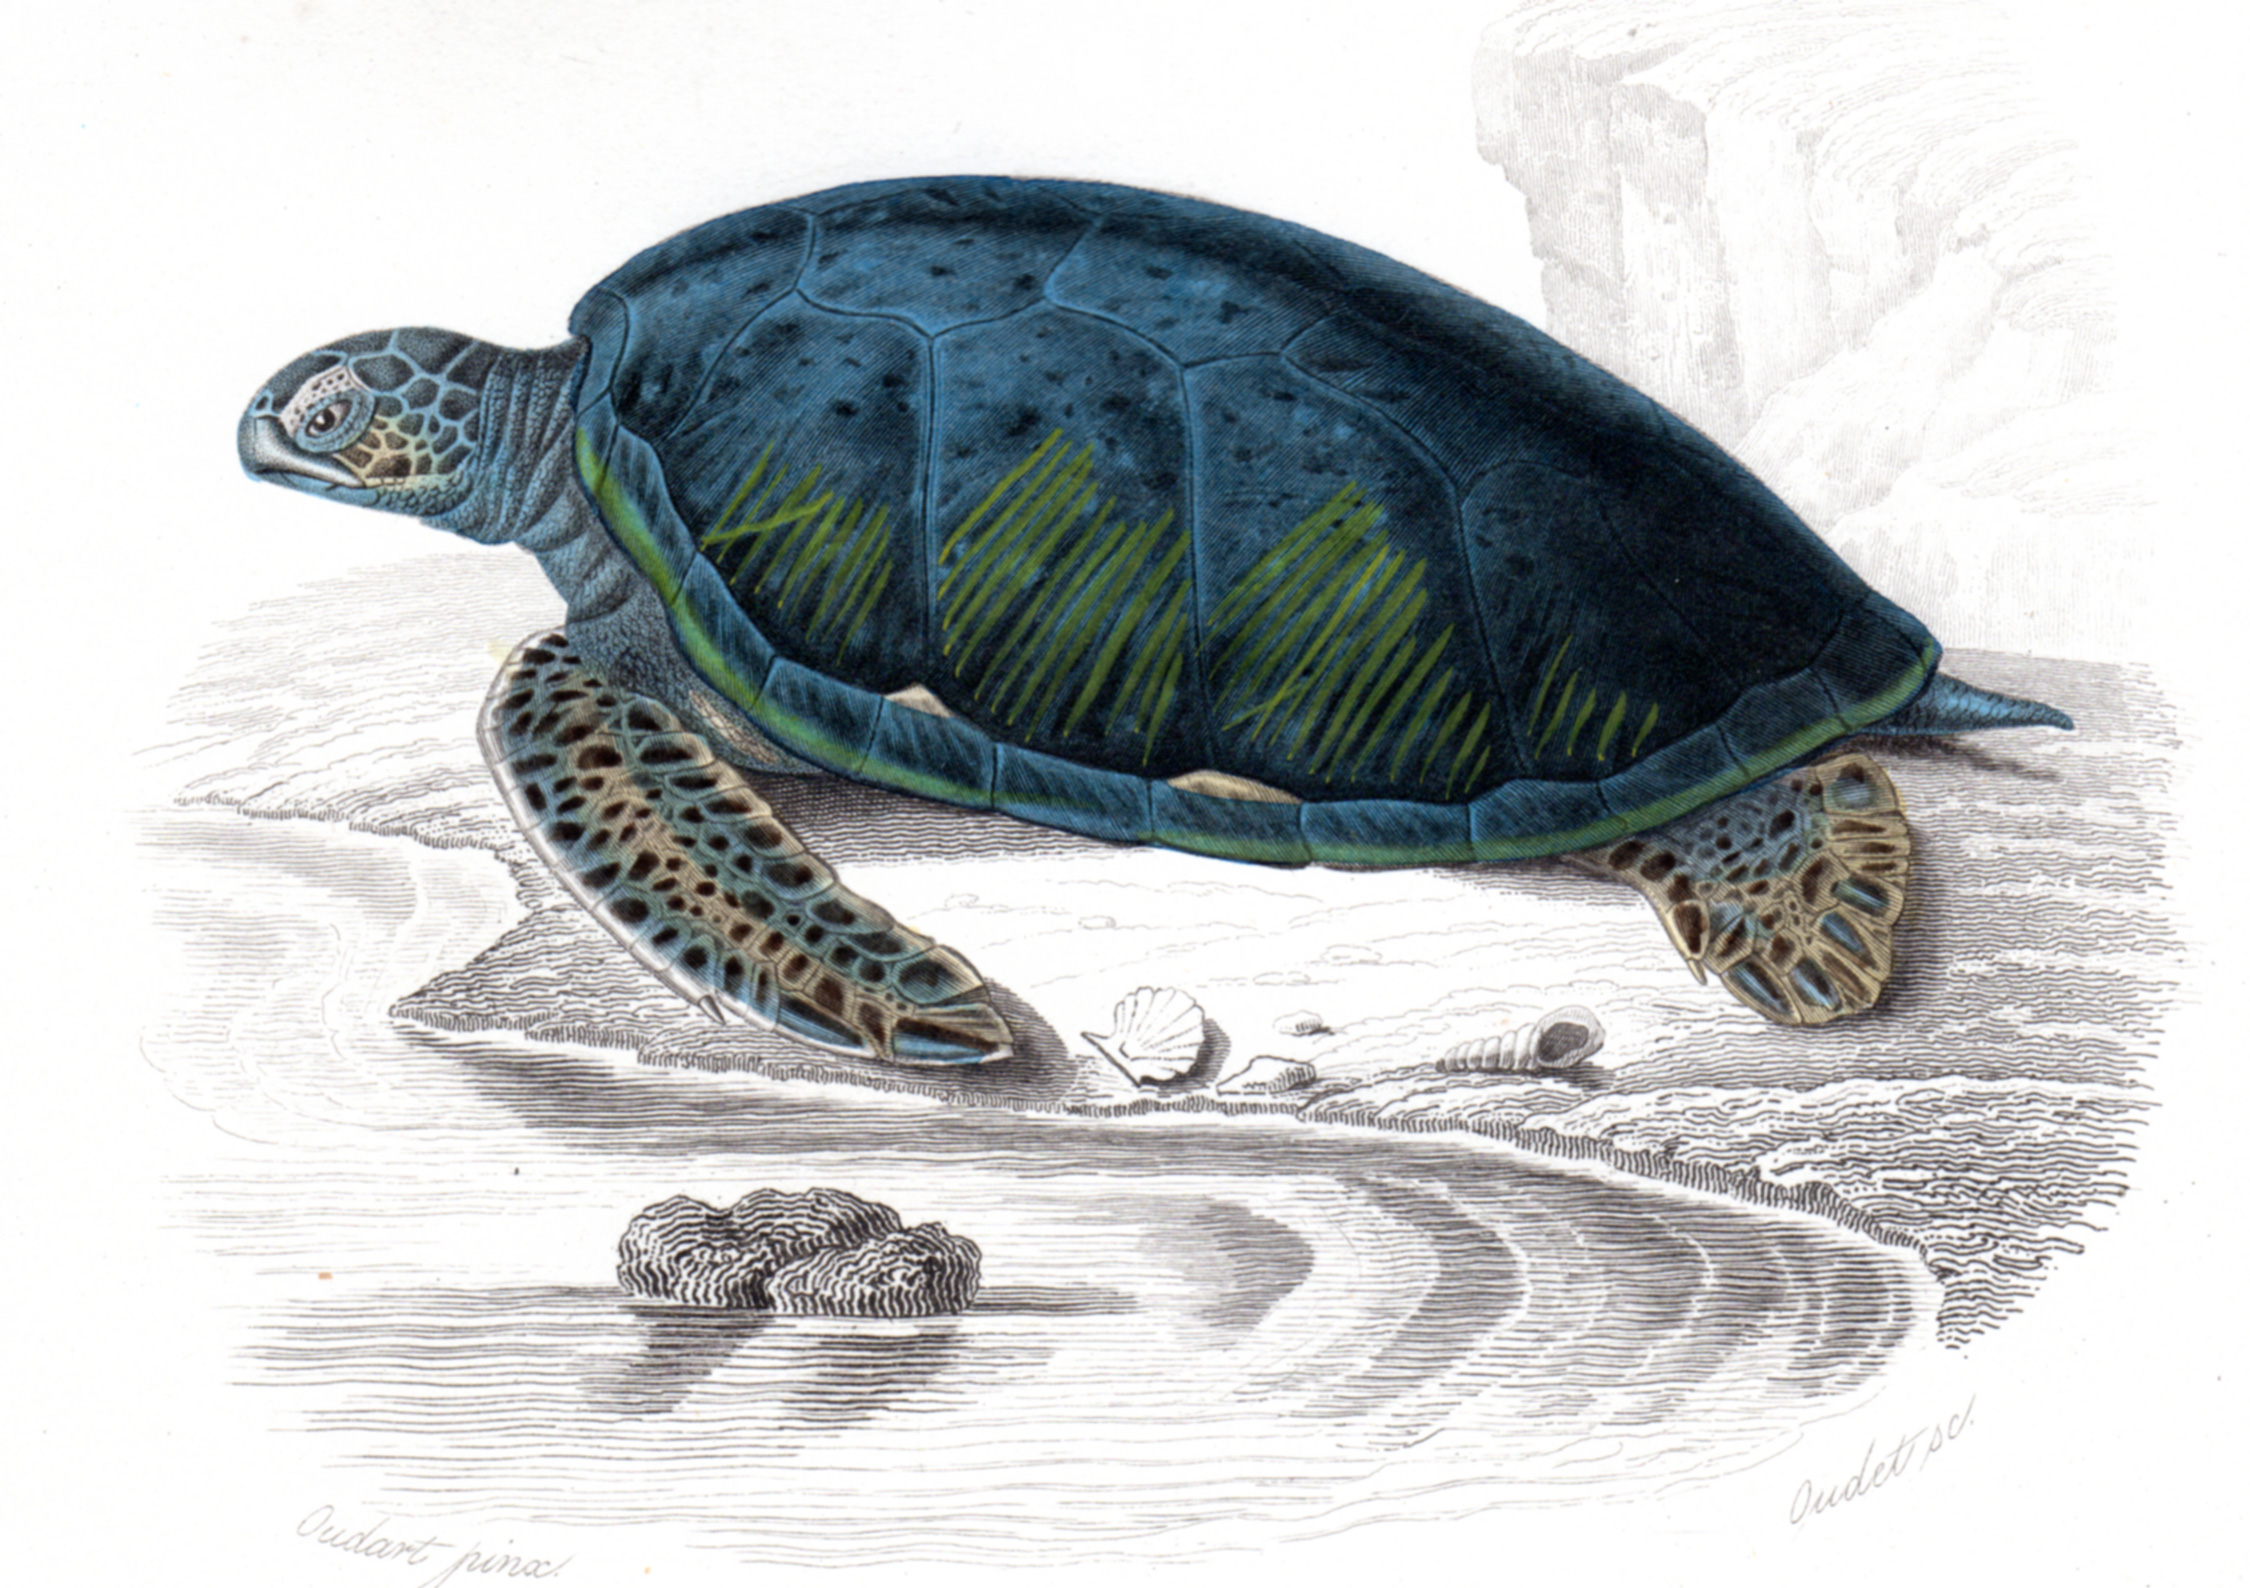 d'Orbigny, Charles –Reptiles, Snakes, etc.